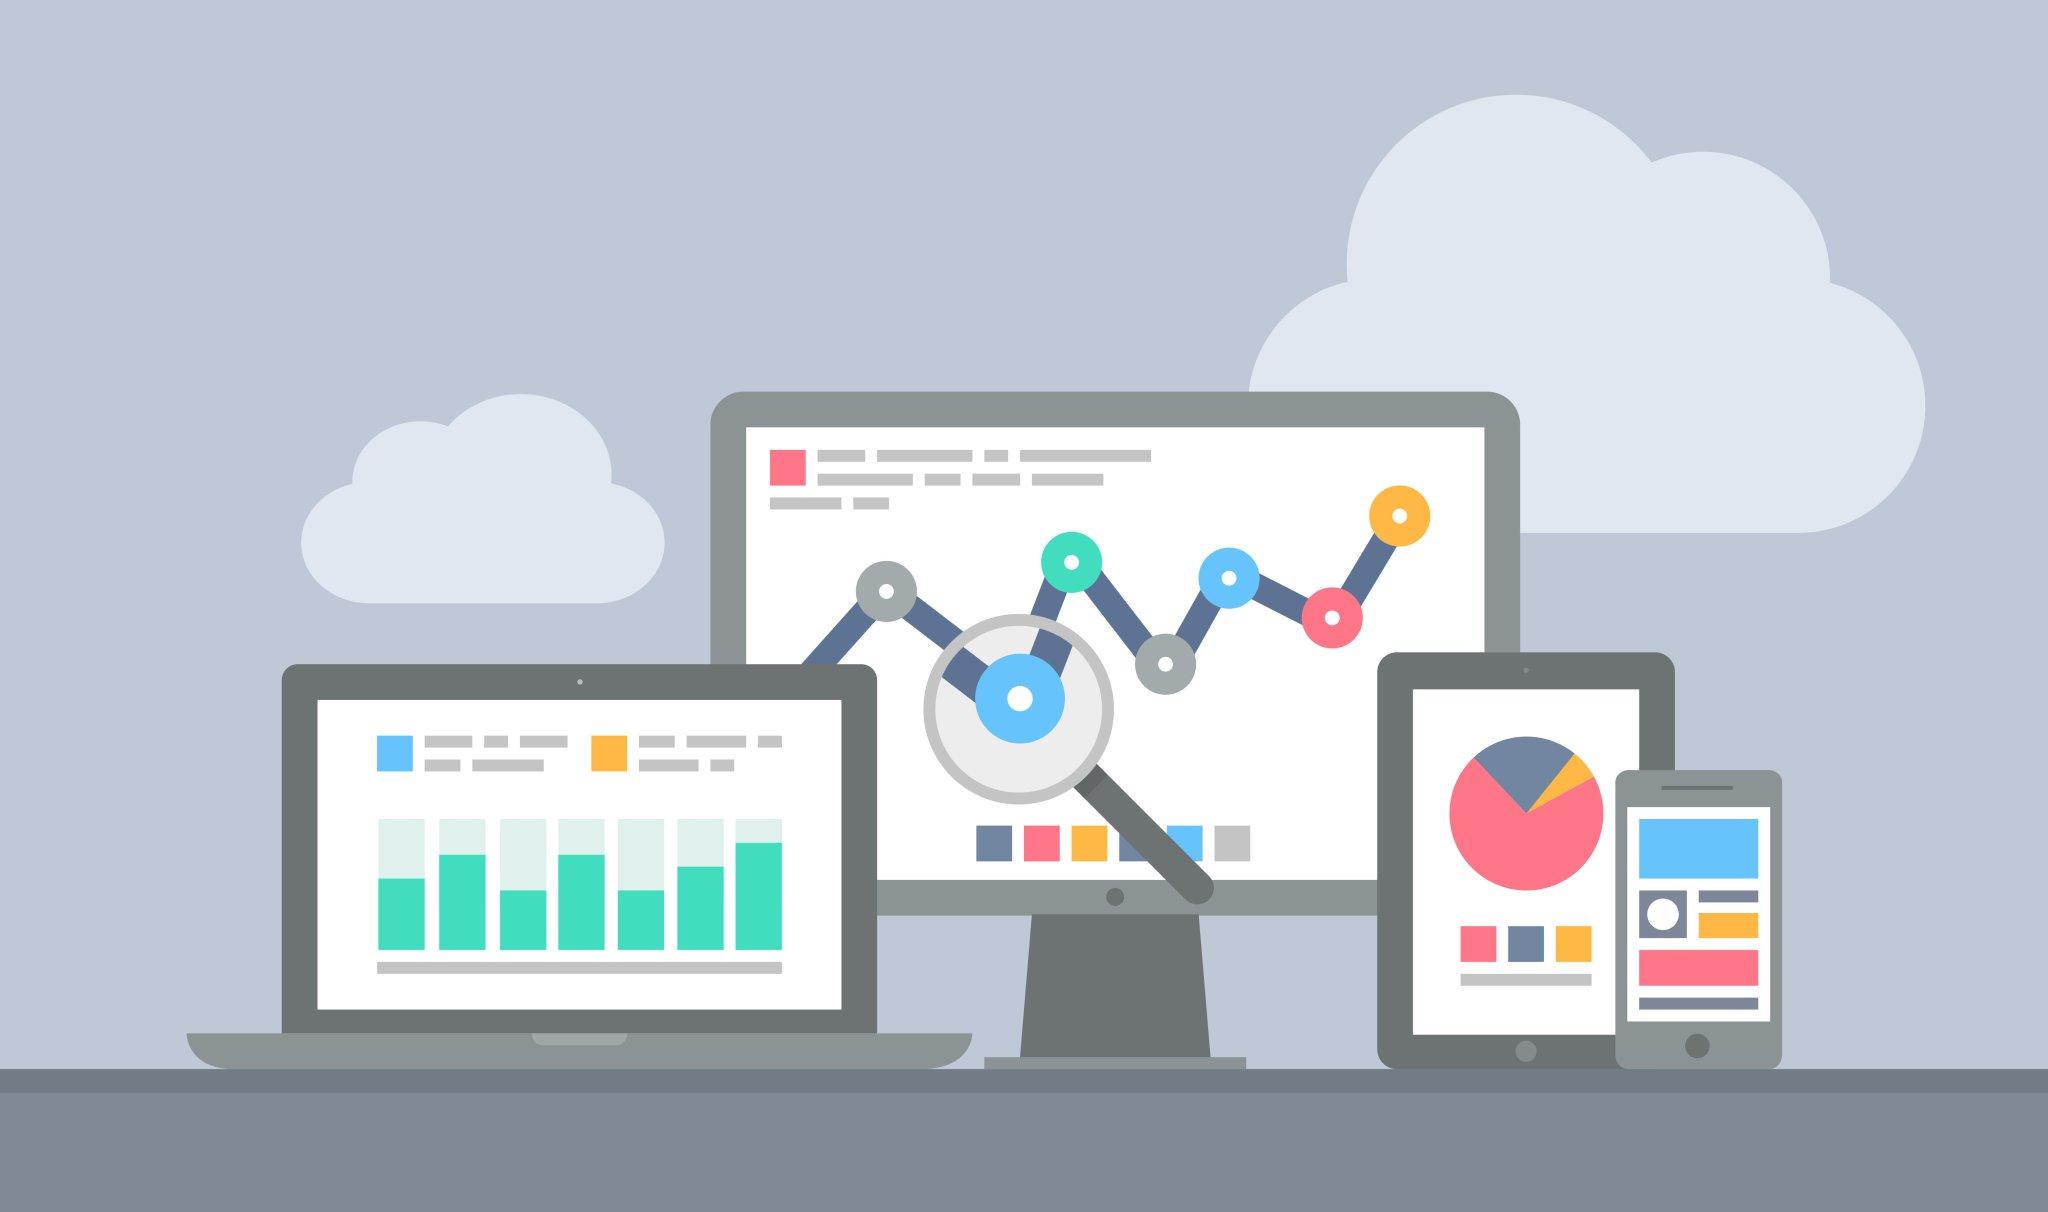 Seo оптимизация и раскрутка сайтов